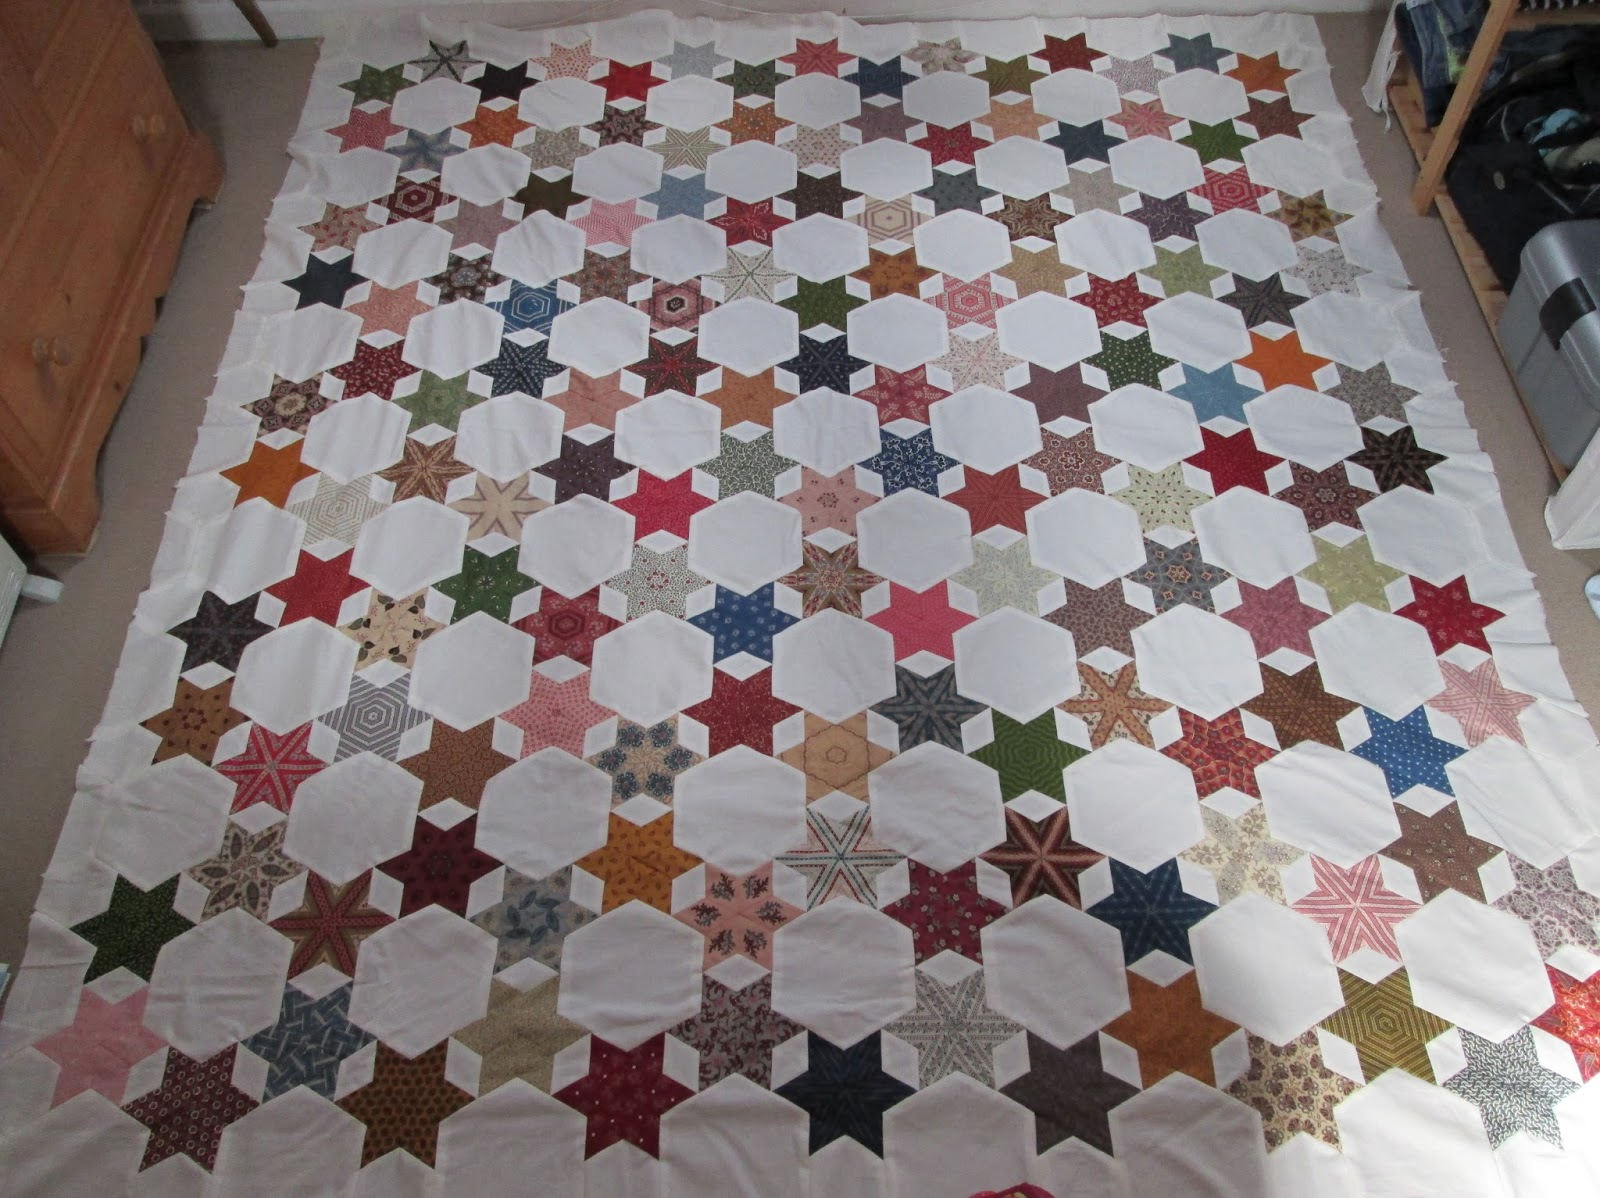 Jersey quilter la passacaglia millefiori quilt tessellations la passacaglia millefiori quilt tessellations vintage stars dailygadgetfo Images